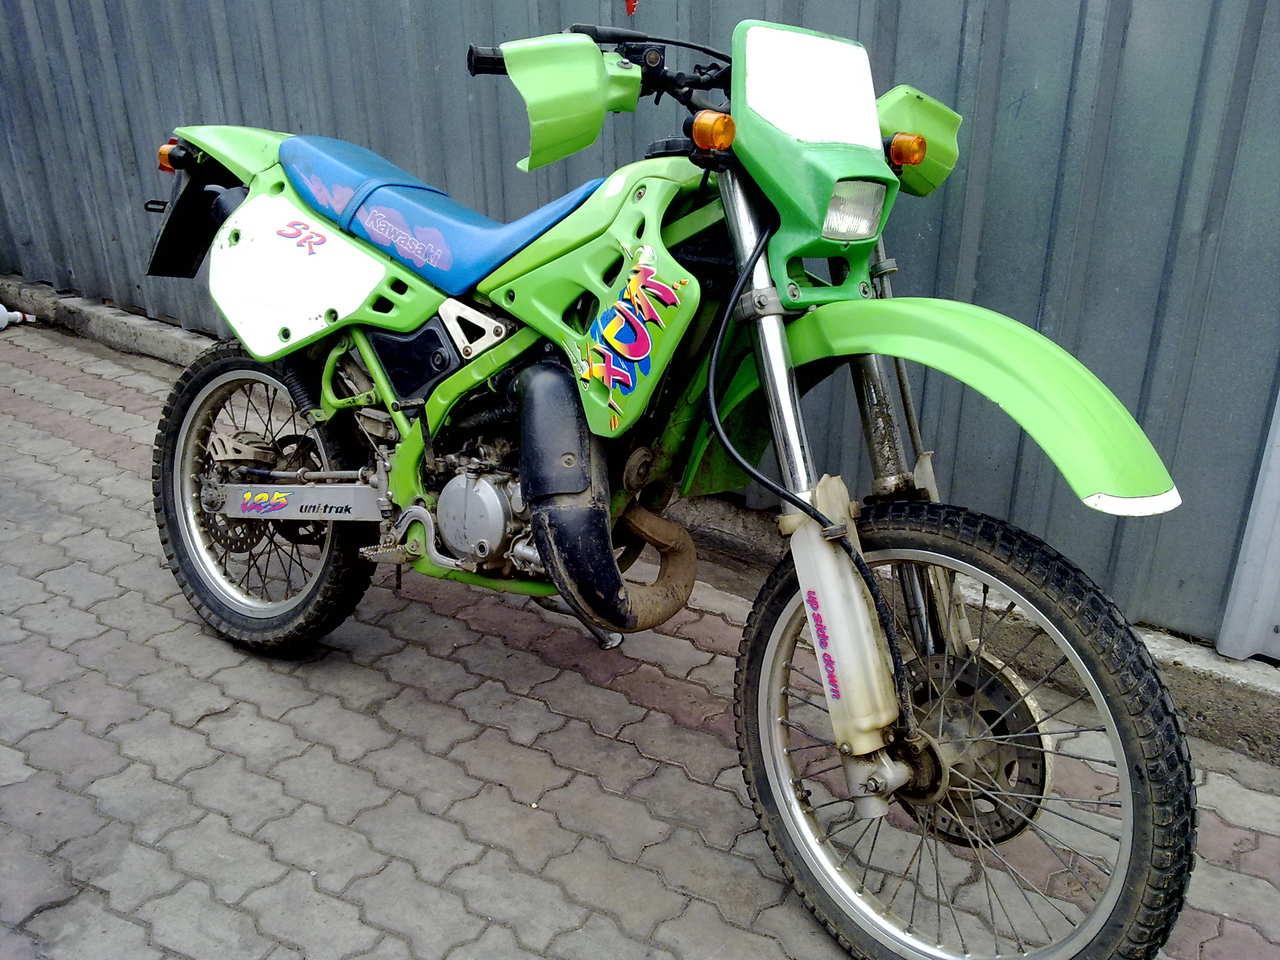 Kdx 125 For Sale 1993 Kawasaki Kdx For Sale